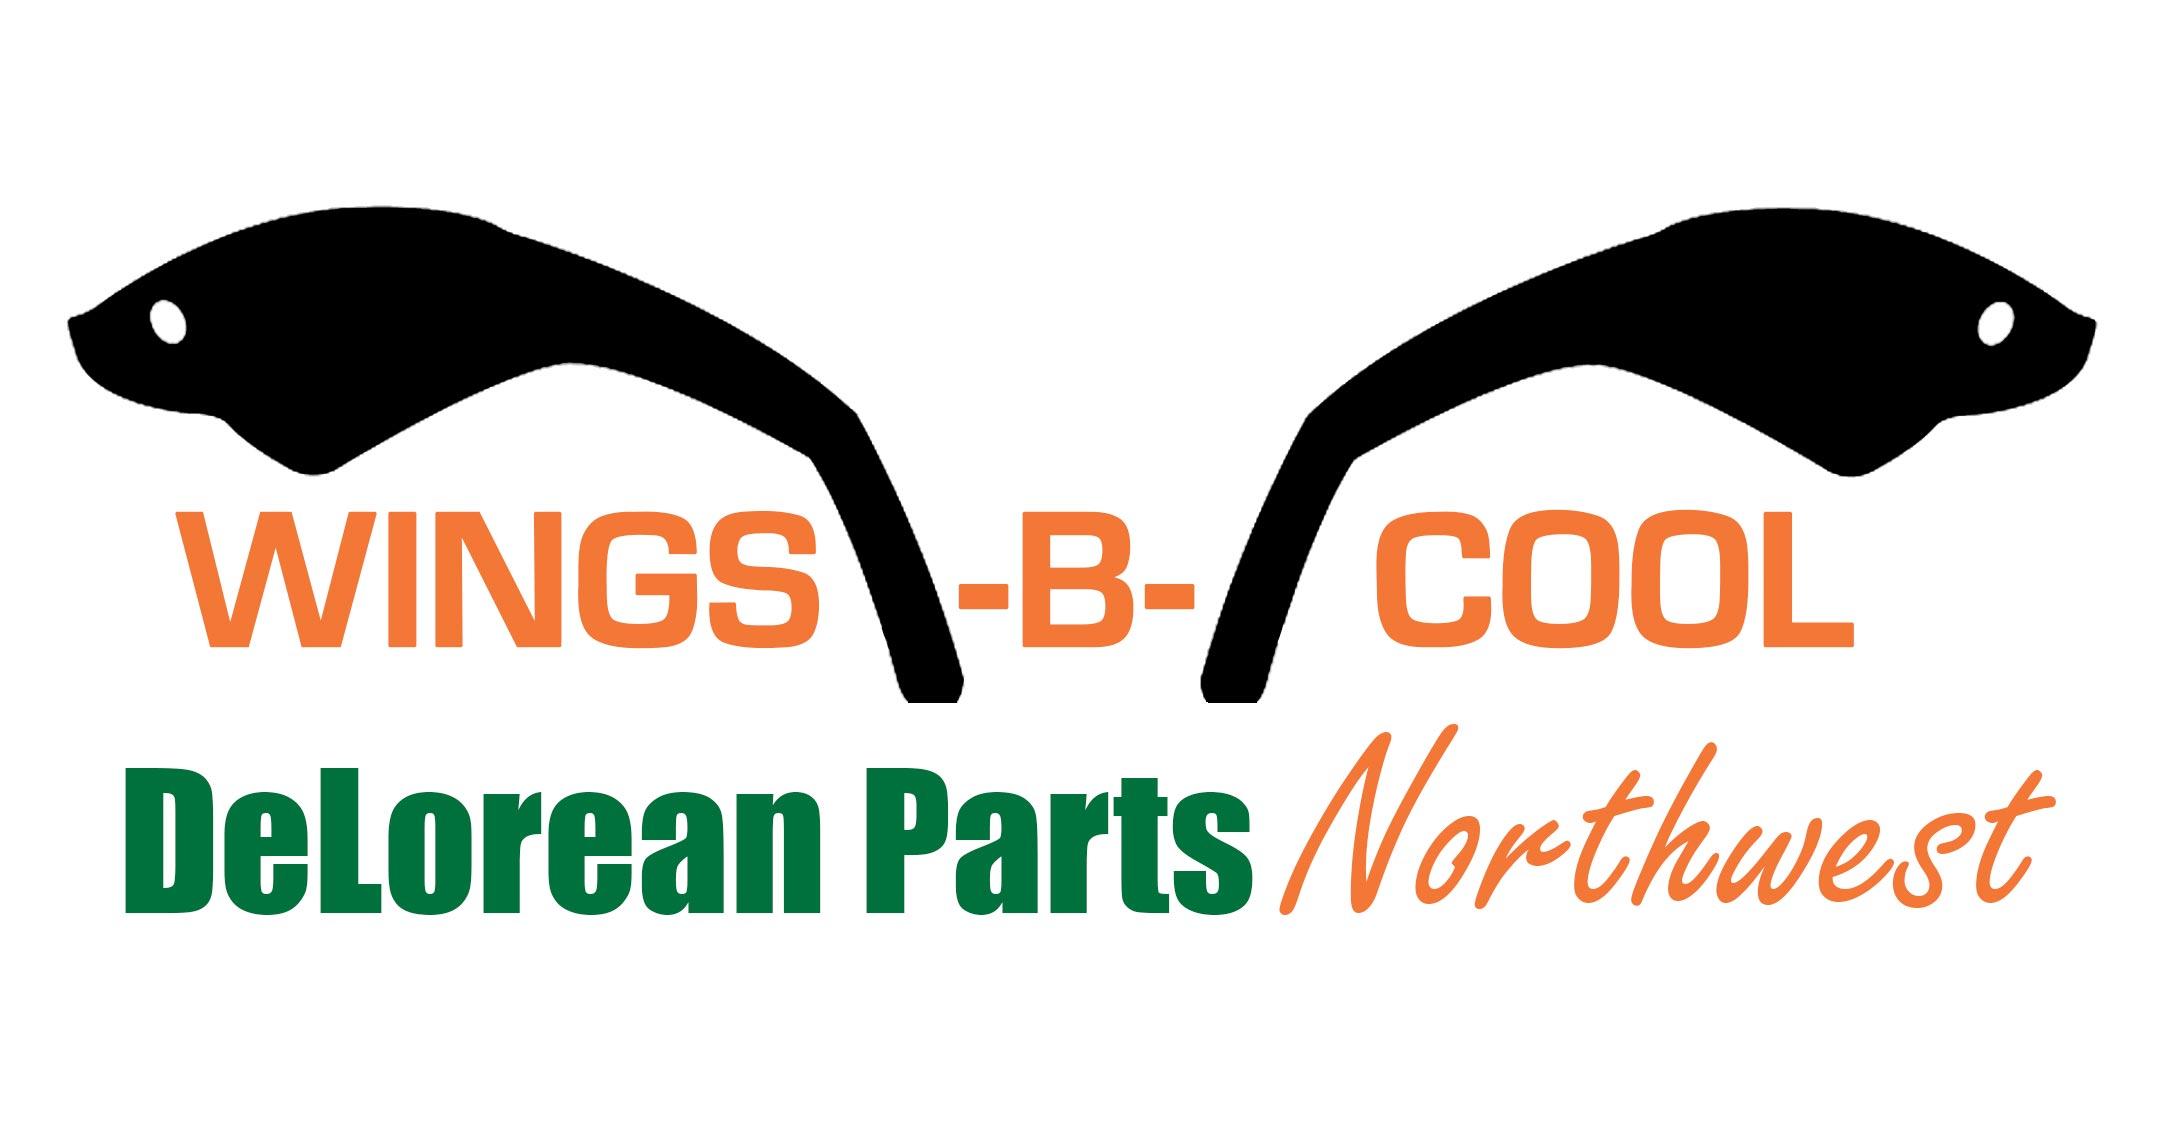 Wings-B-Cool | DeLorean Parts Northwest